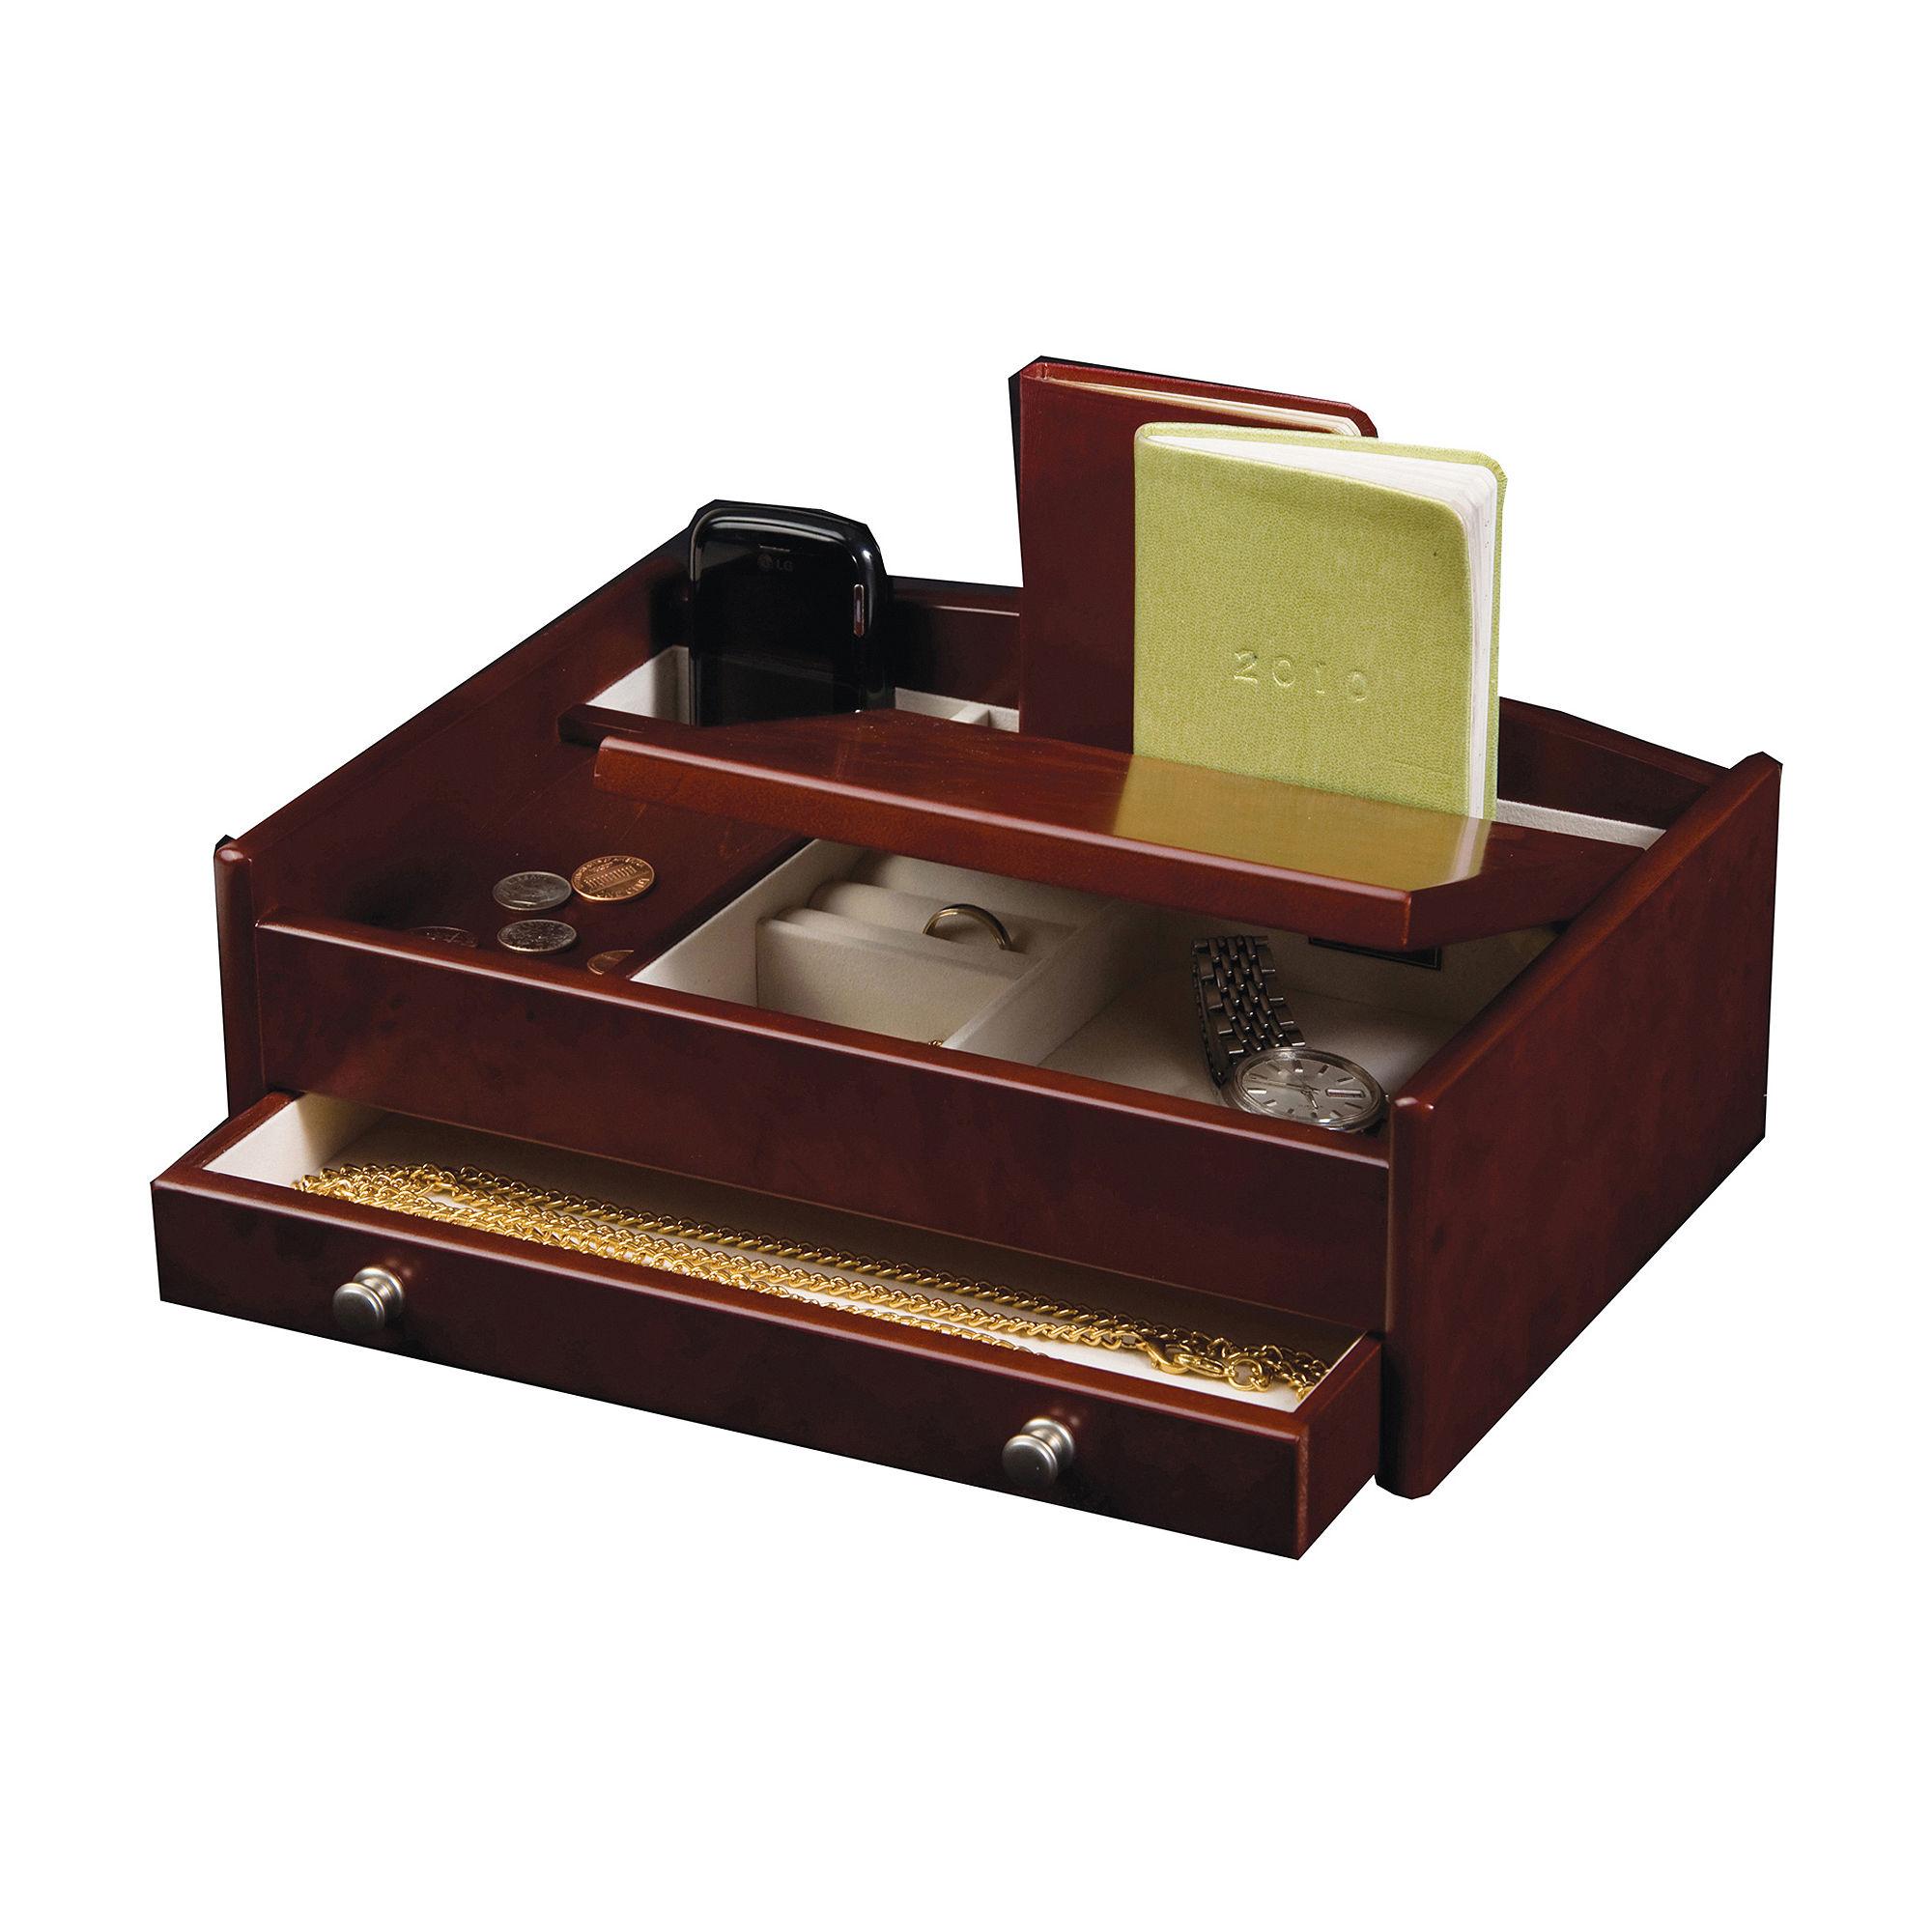 Upc 739175523358 mele co davin men 39 s dresser top for Macy s standing jewelry box